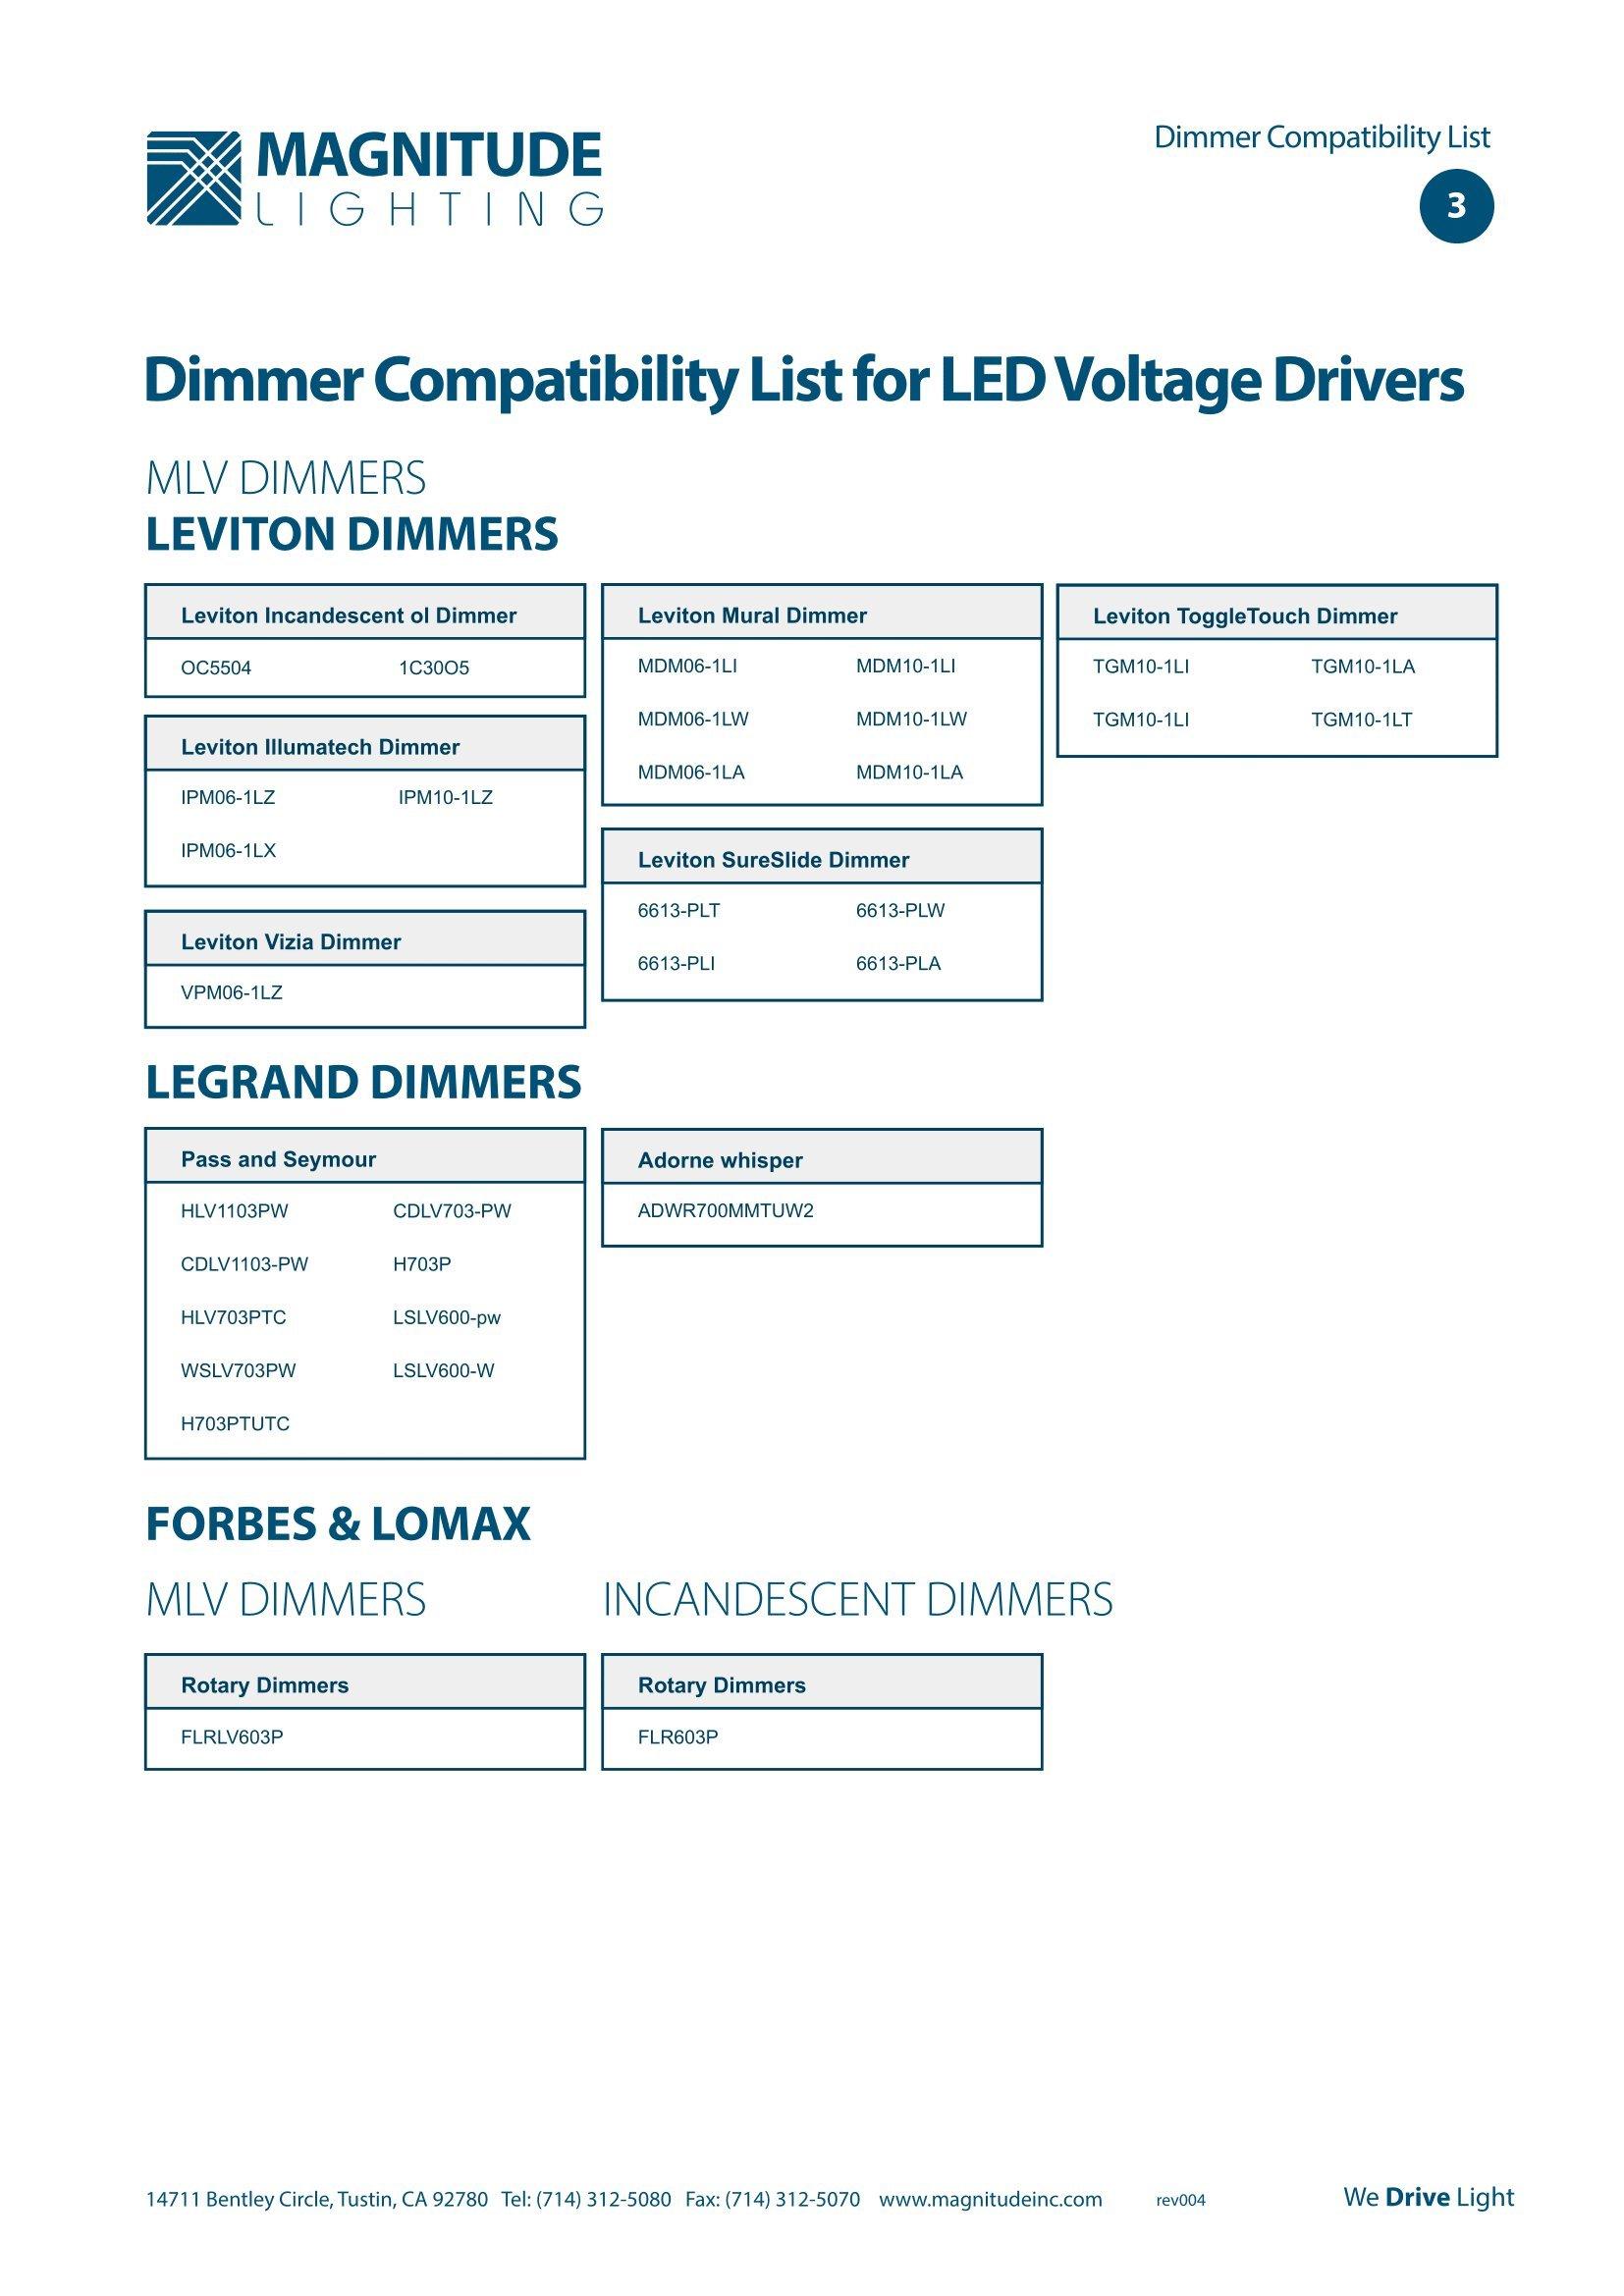 Magnitude Dimmable LED Driver Solidrive Transformer Hardwired Under Cabinet Lighting 24V 96 Watt CVD96L24DC - Inspired LED